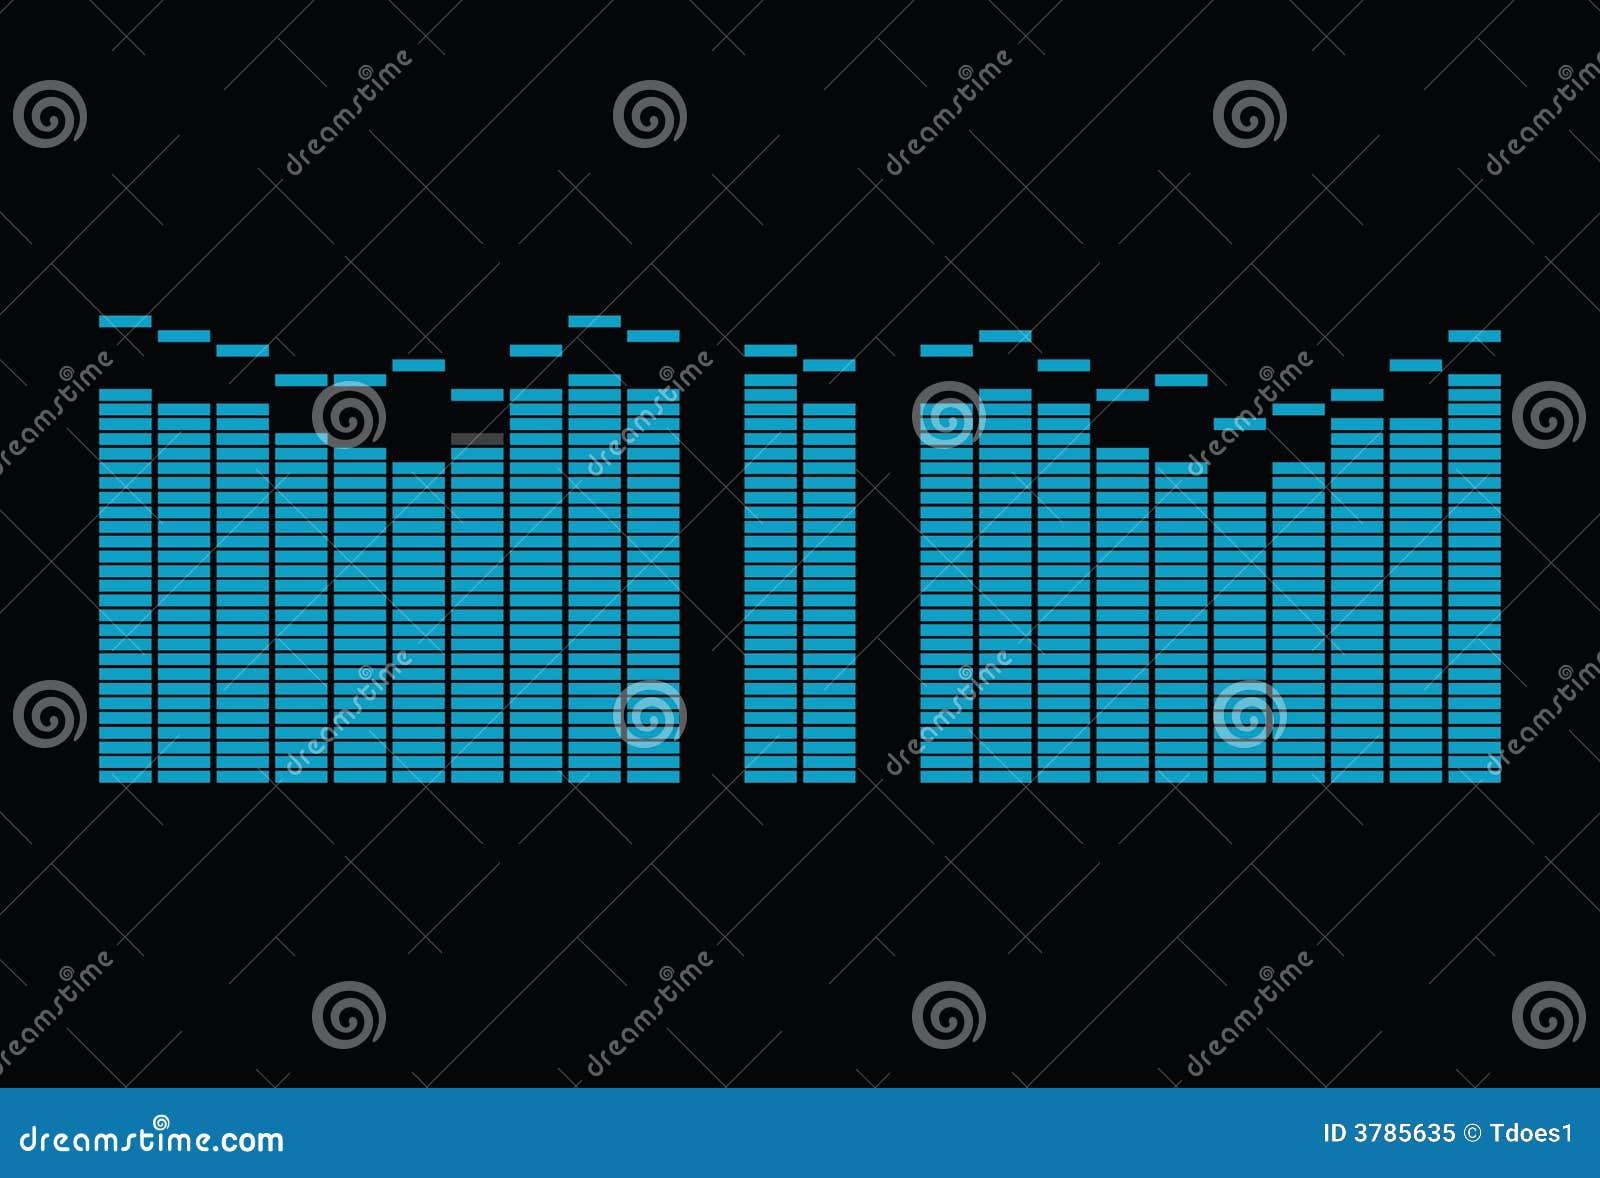 equalizer spectrum 1 stock illustration  illustration of music